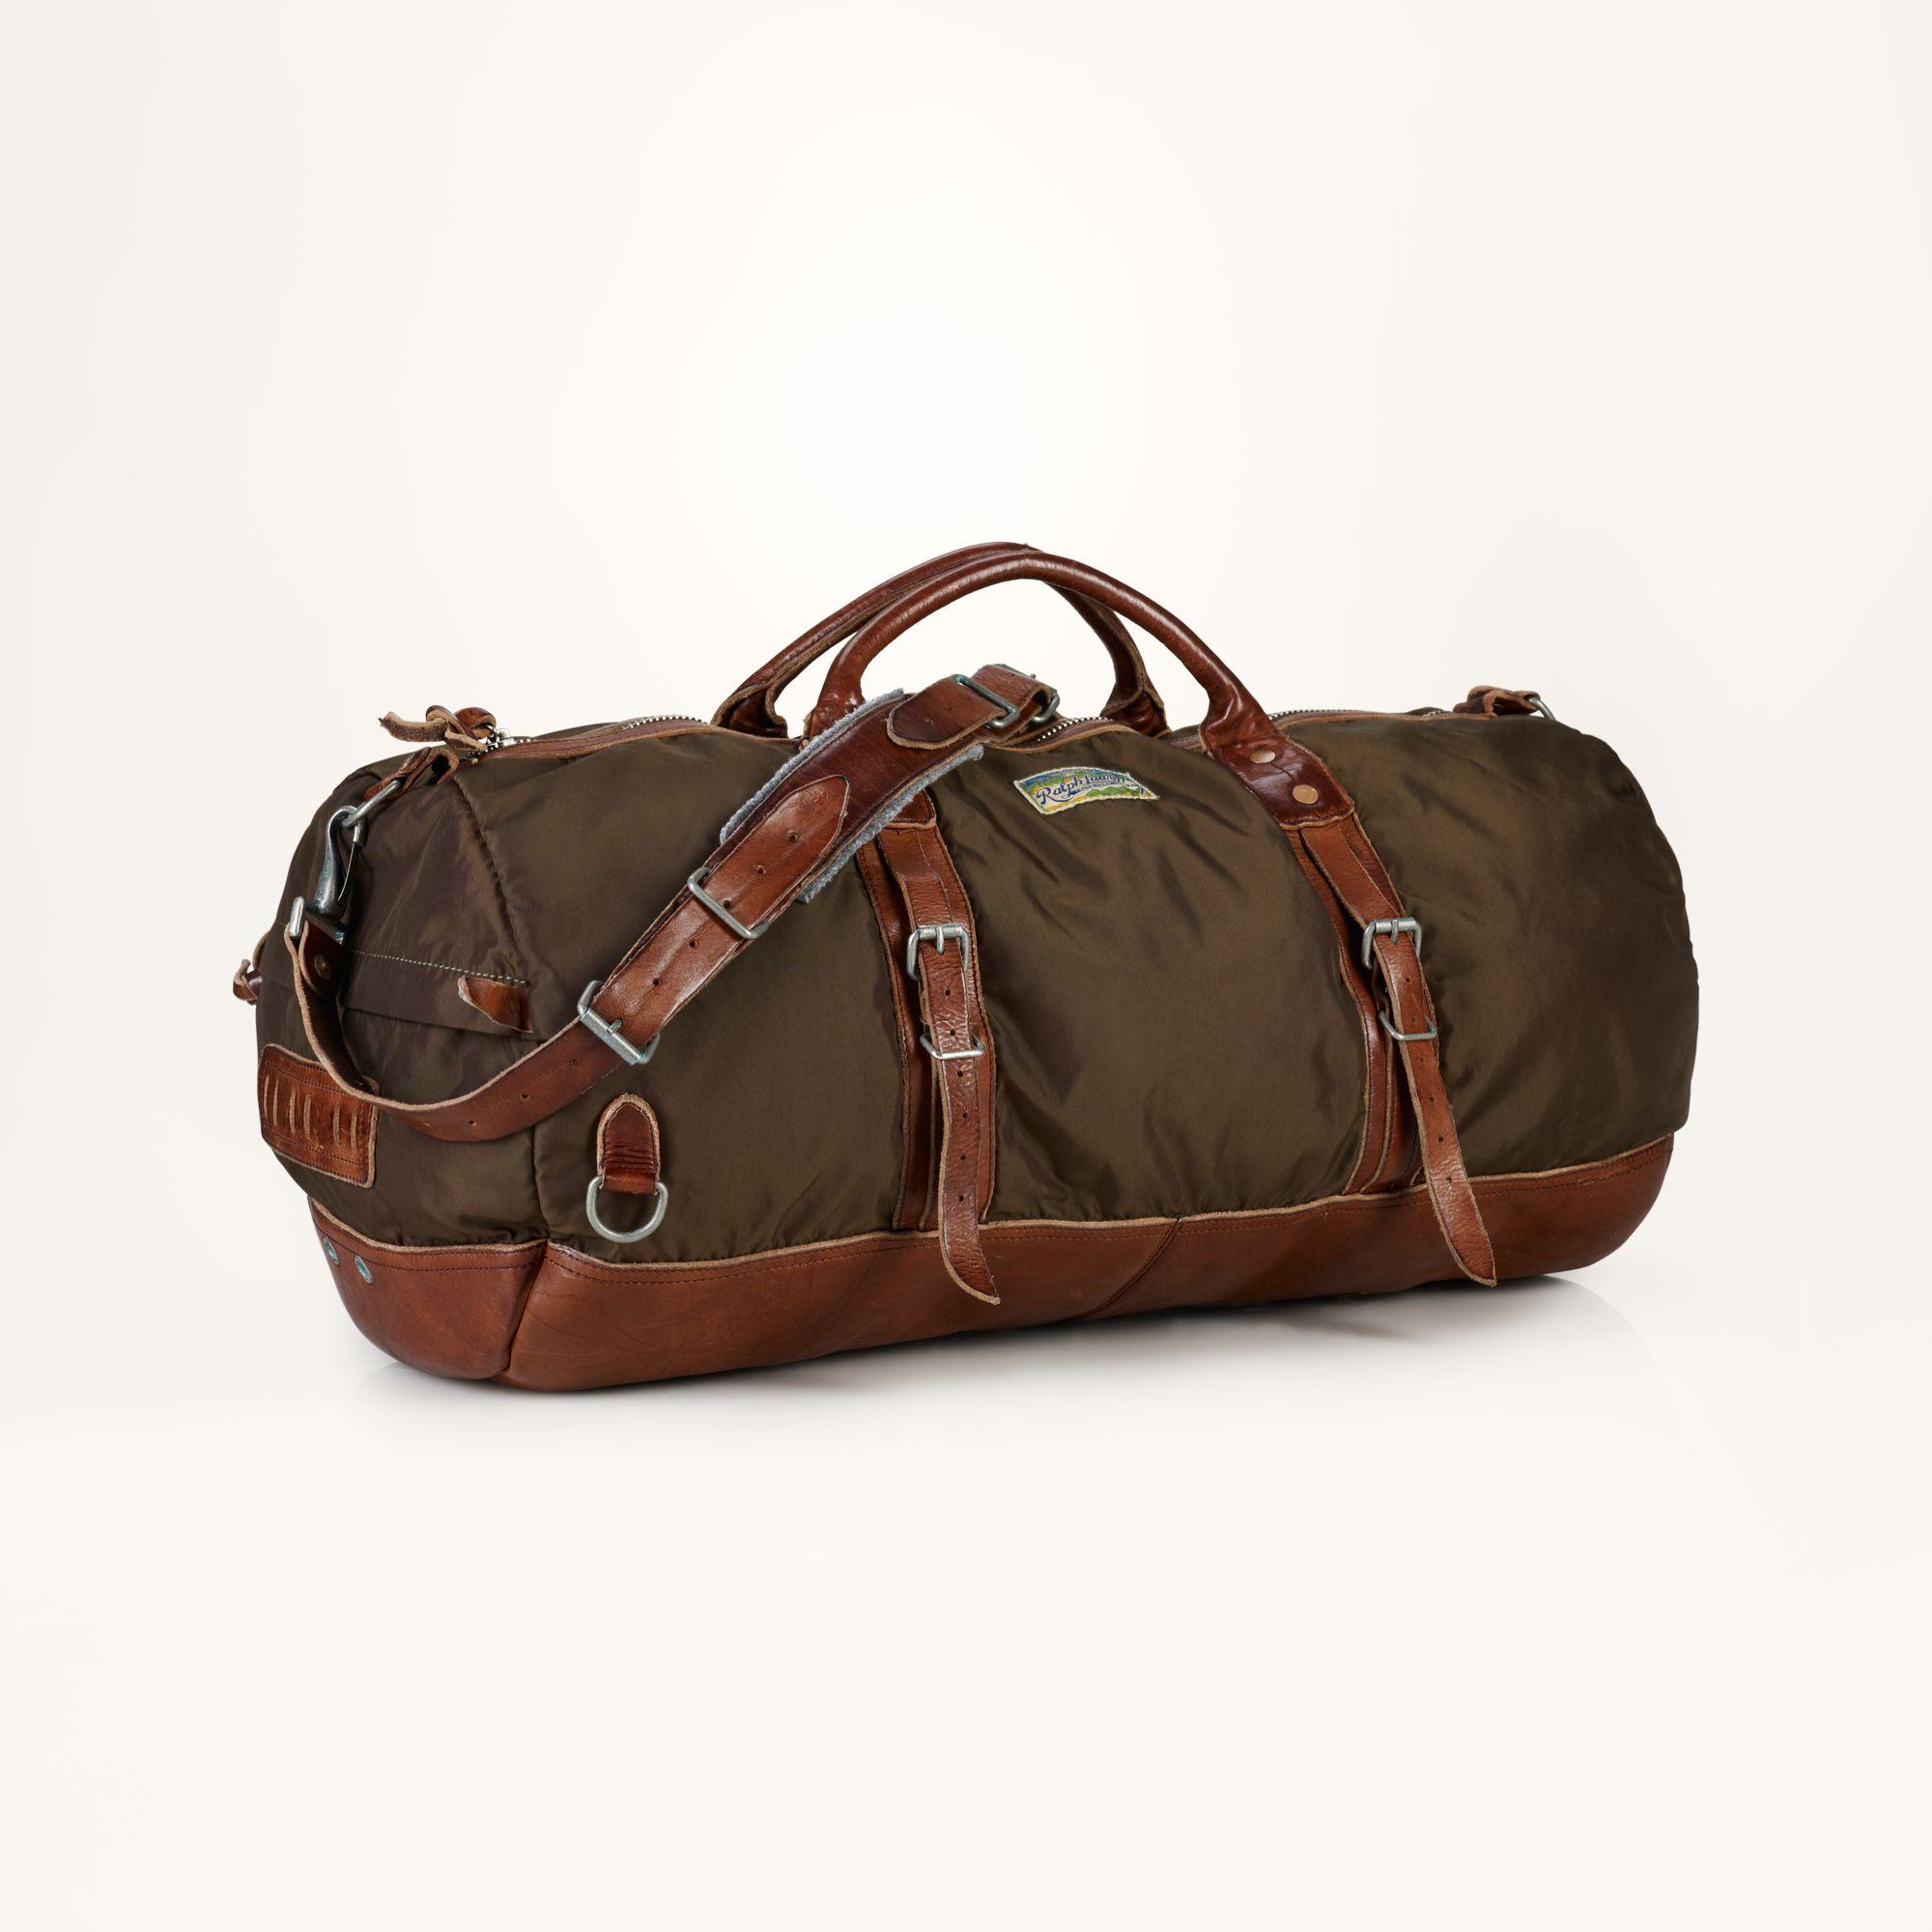 2d5244cf242 Polo Ralph Lauren Nylon Duffel Bag in Green for Men - Lyst